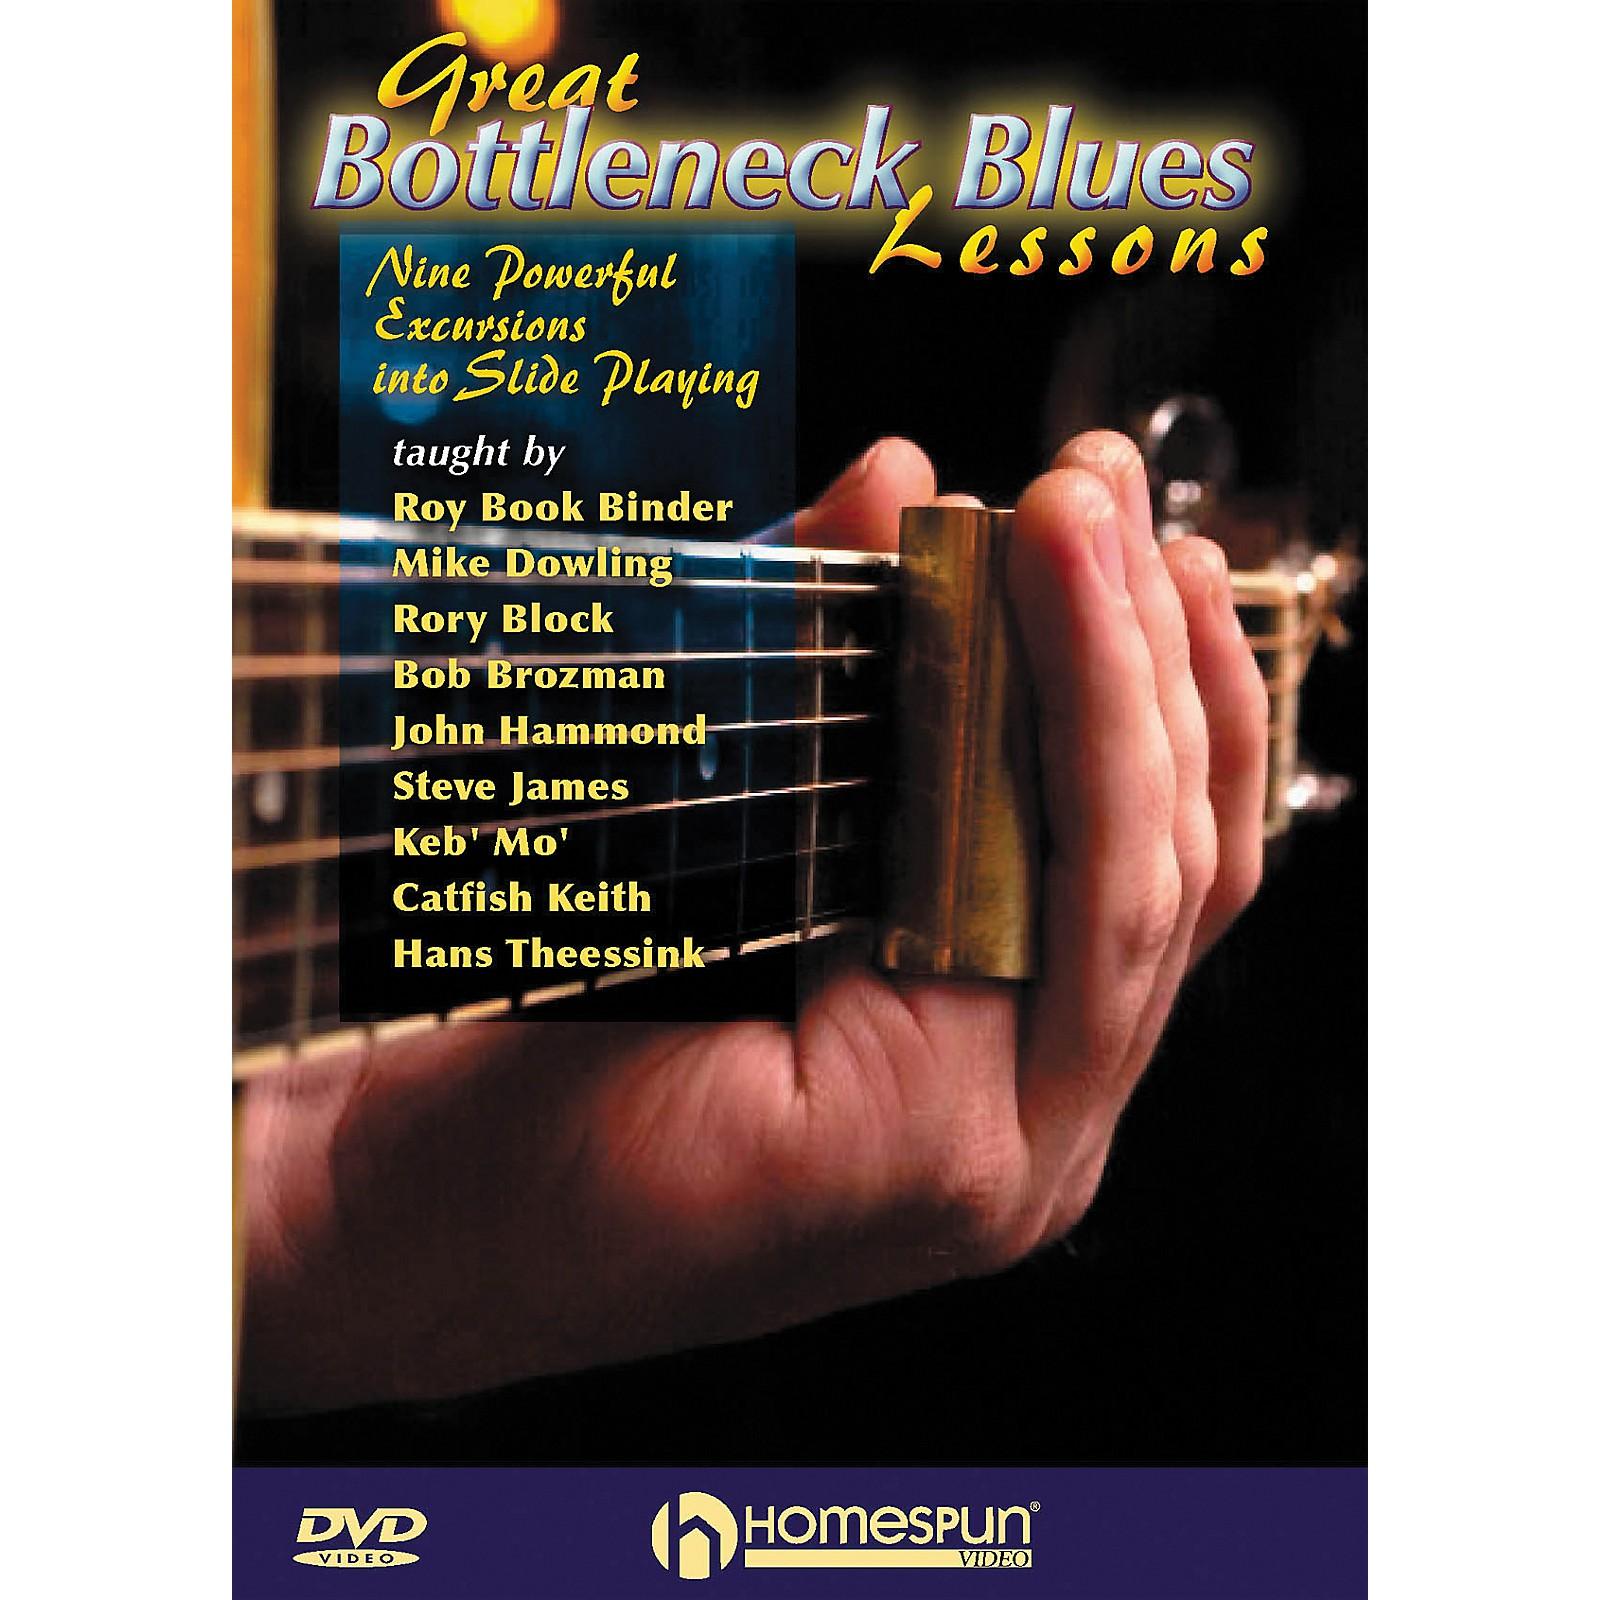 Homespun Great Bottleneck Blues Guitar Lessons (DVD)